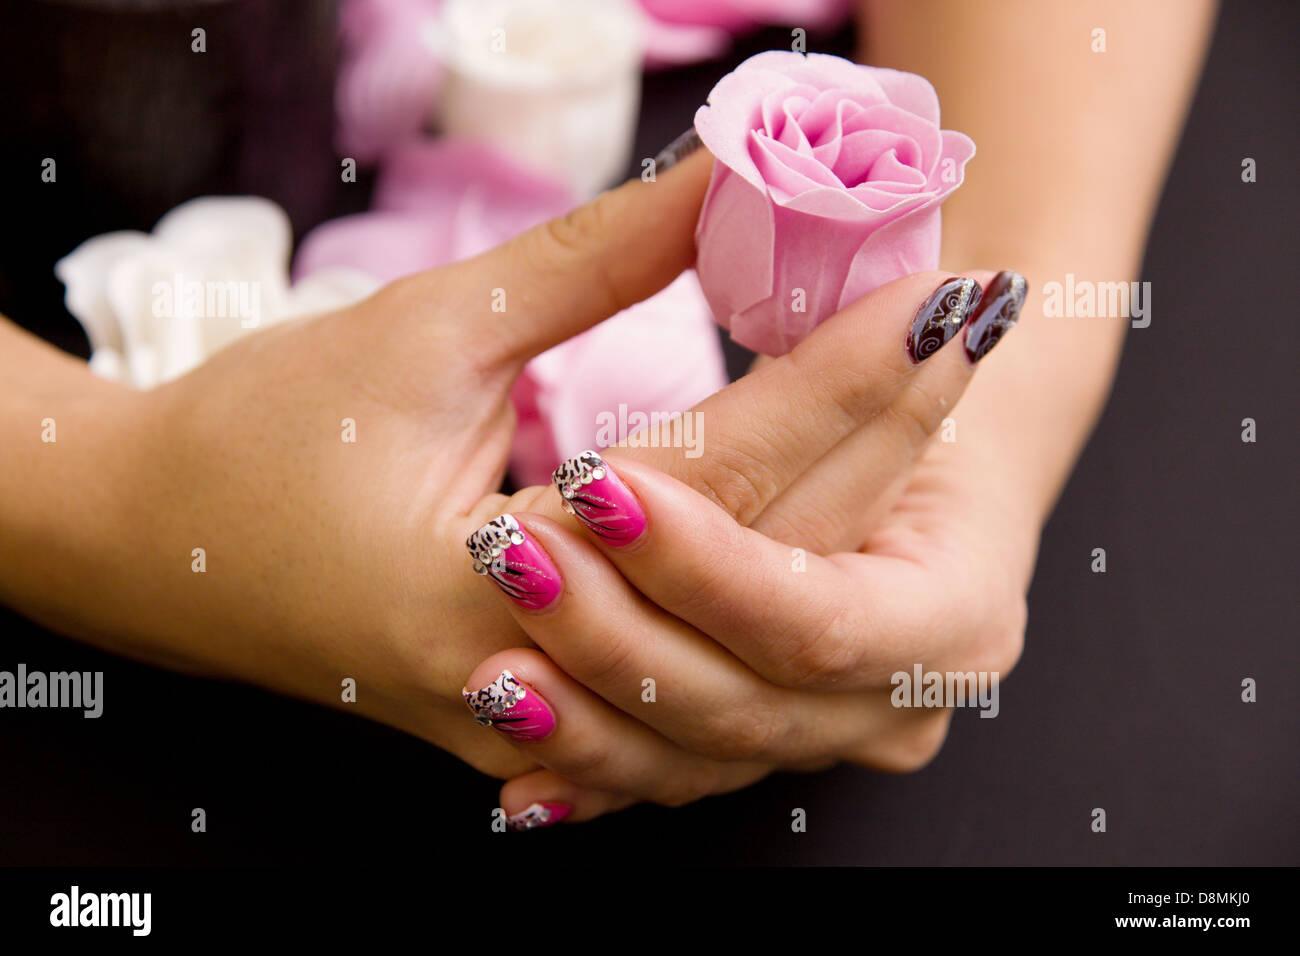 Women's manicure arranged - Stock Image